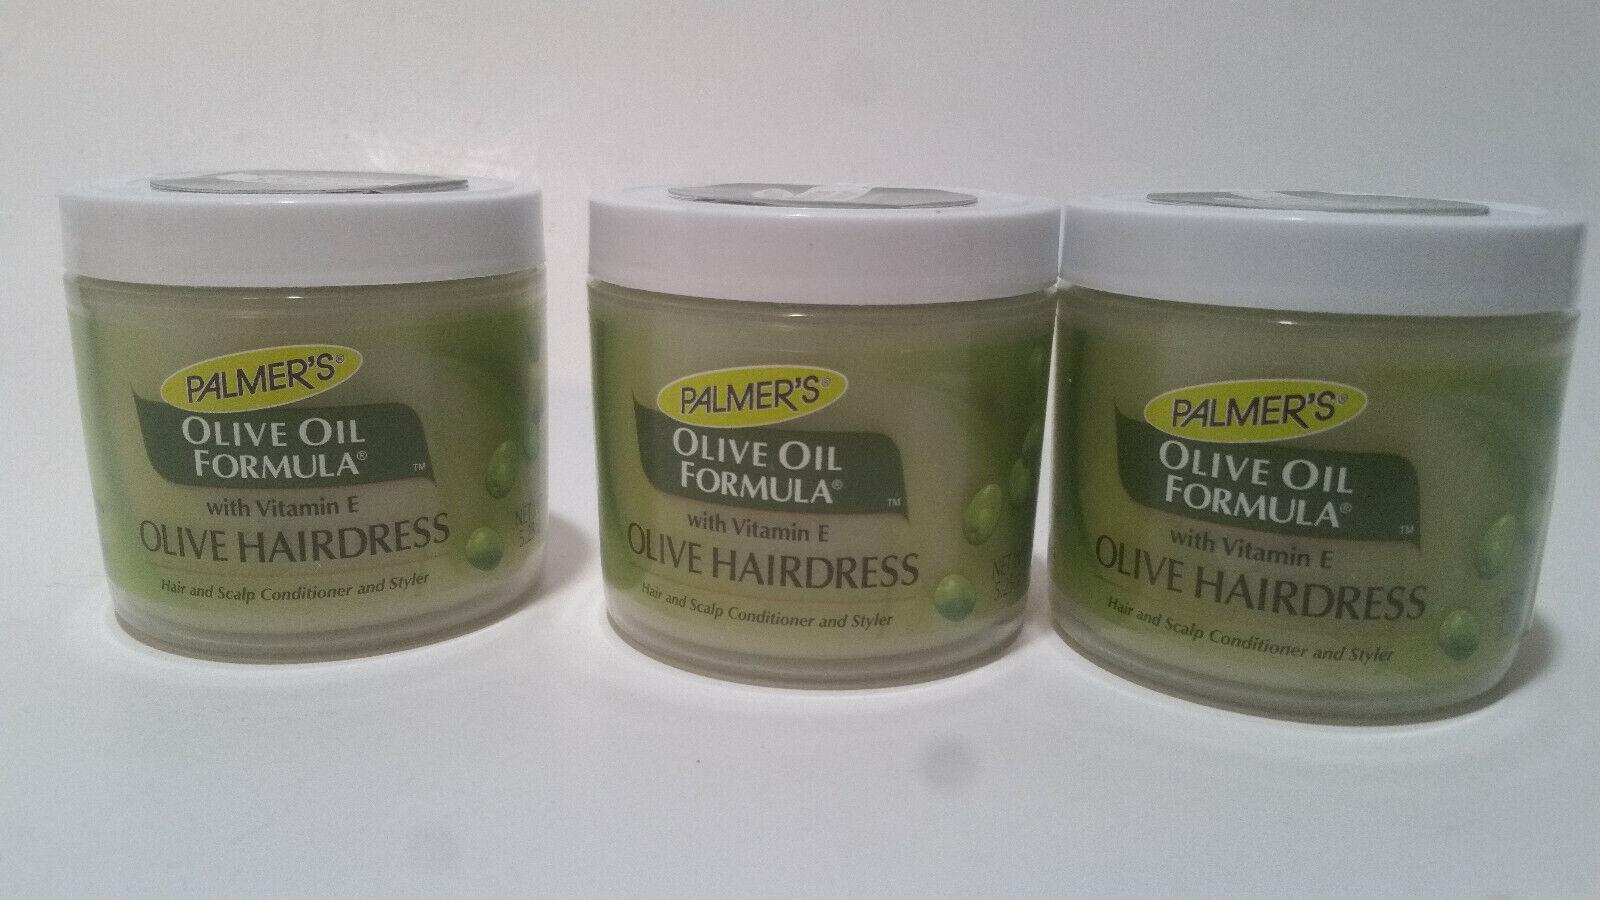 3 Palmer's Olive Oil Formula With VitaminE Olive Hairdress F